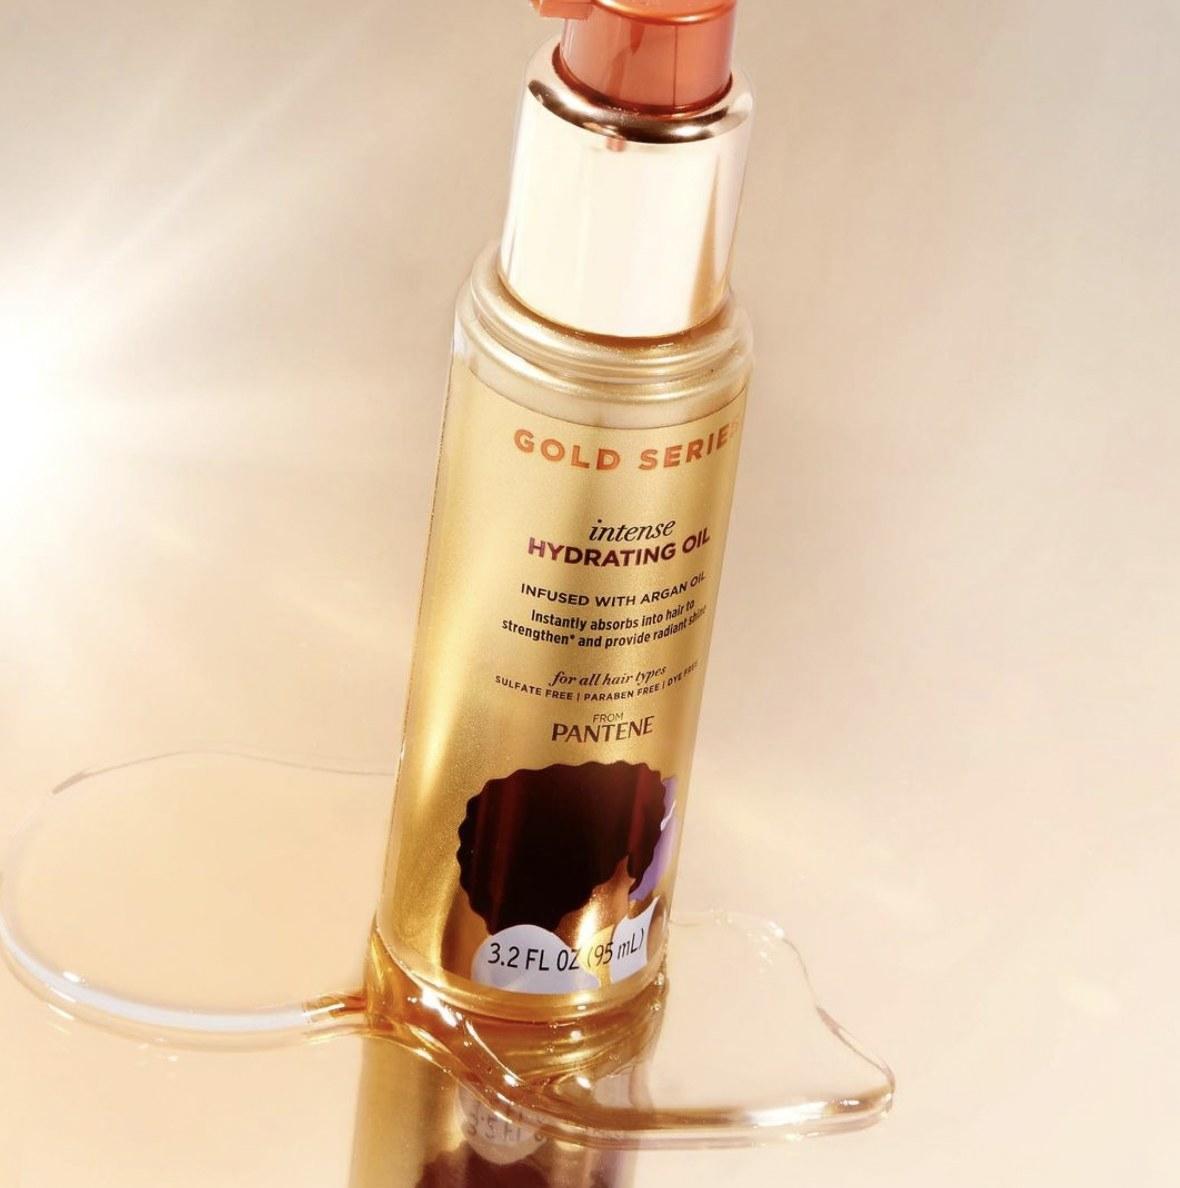 A bottle of oil treatment